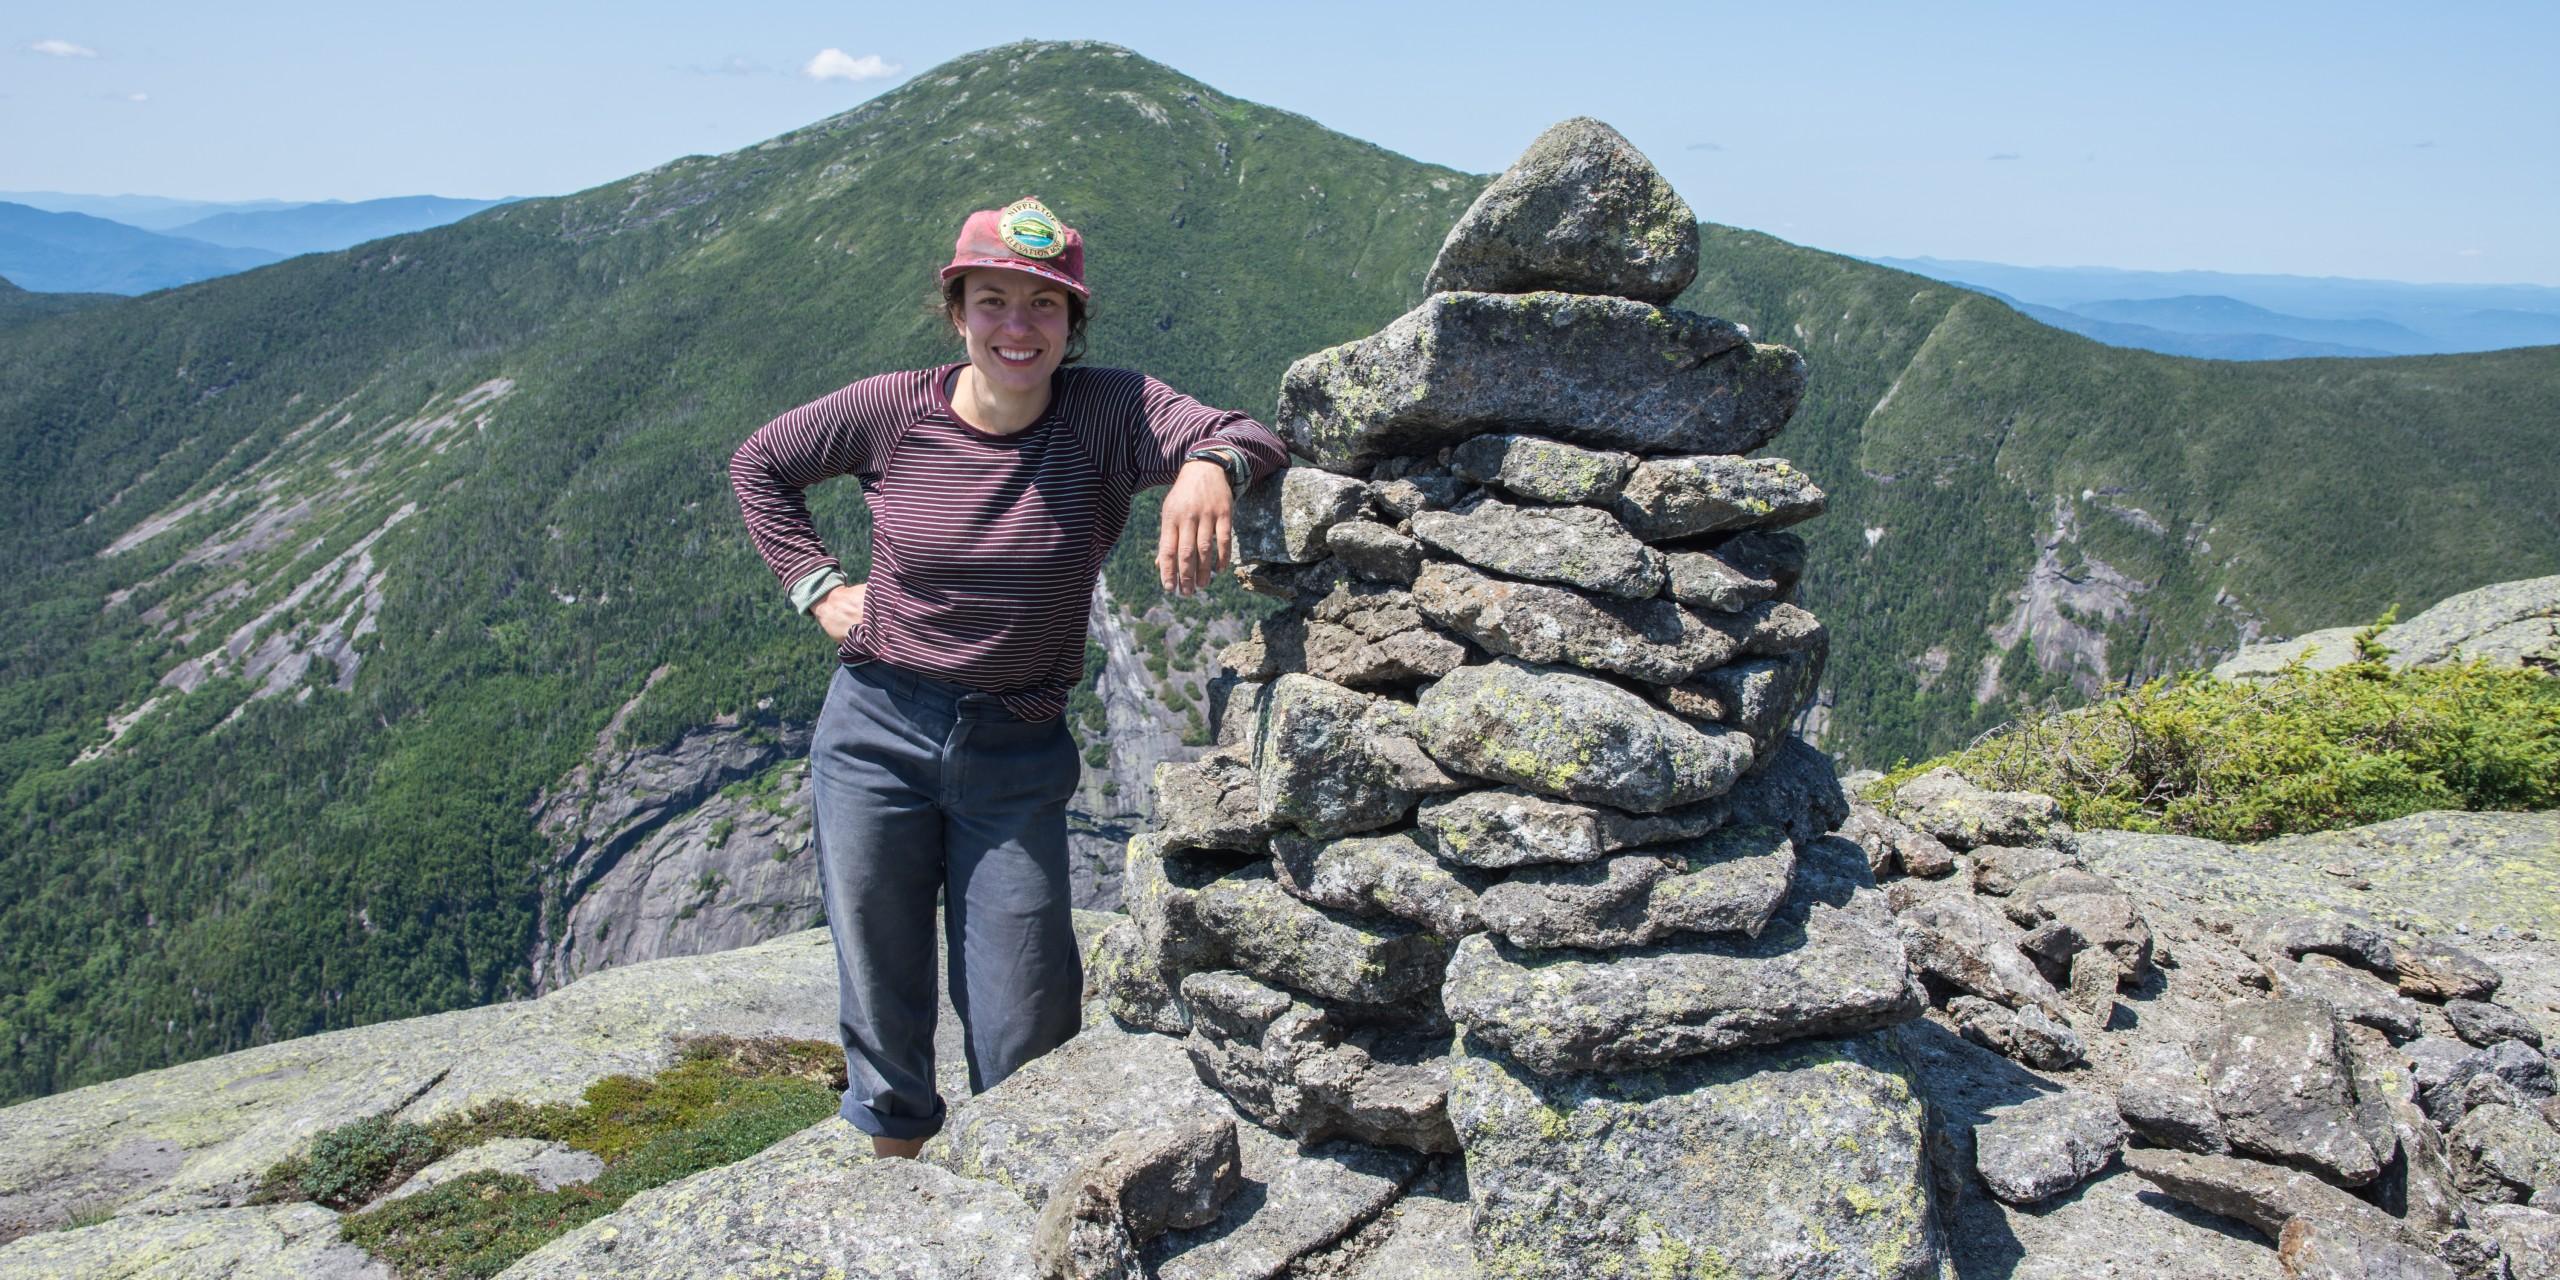 Trail worker on a summit